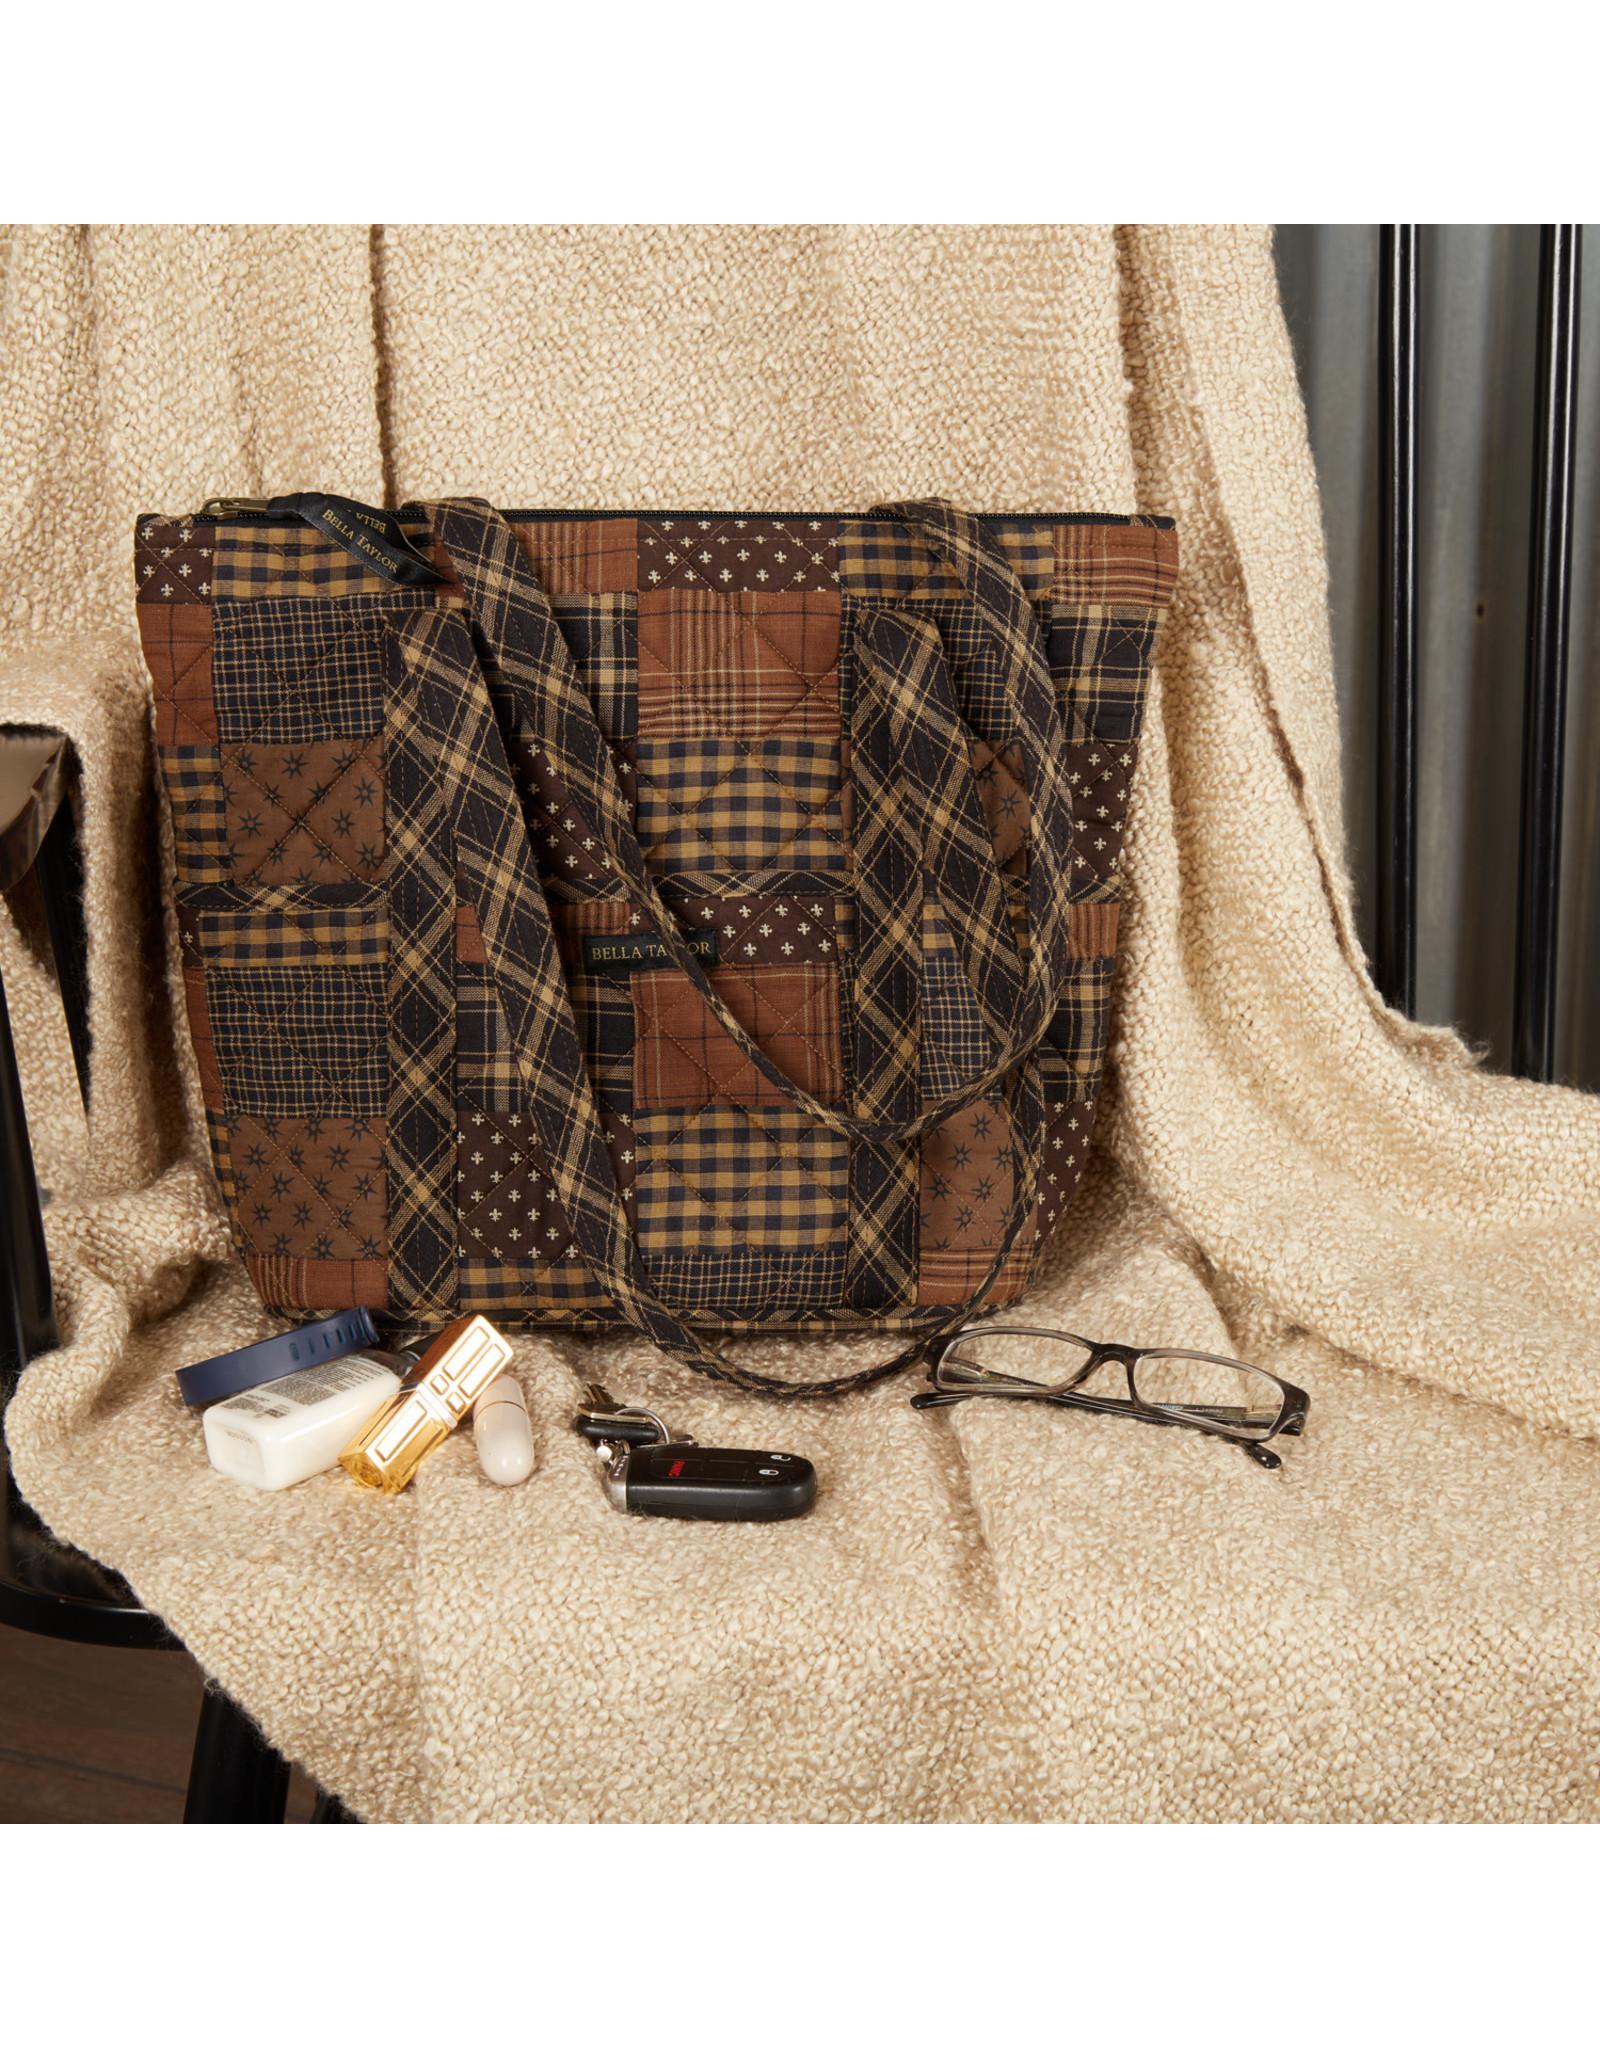 Bella Taylor Ironstone - Stride handbag